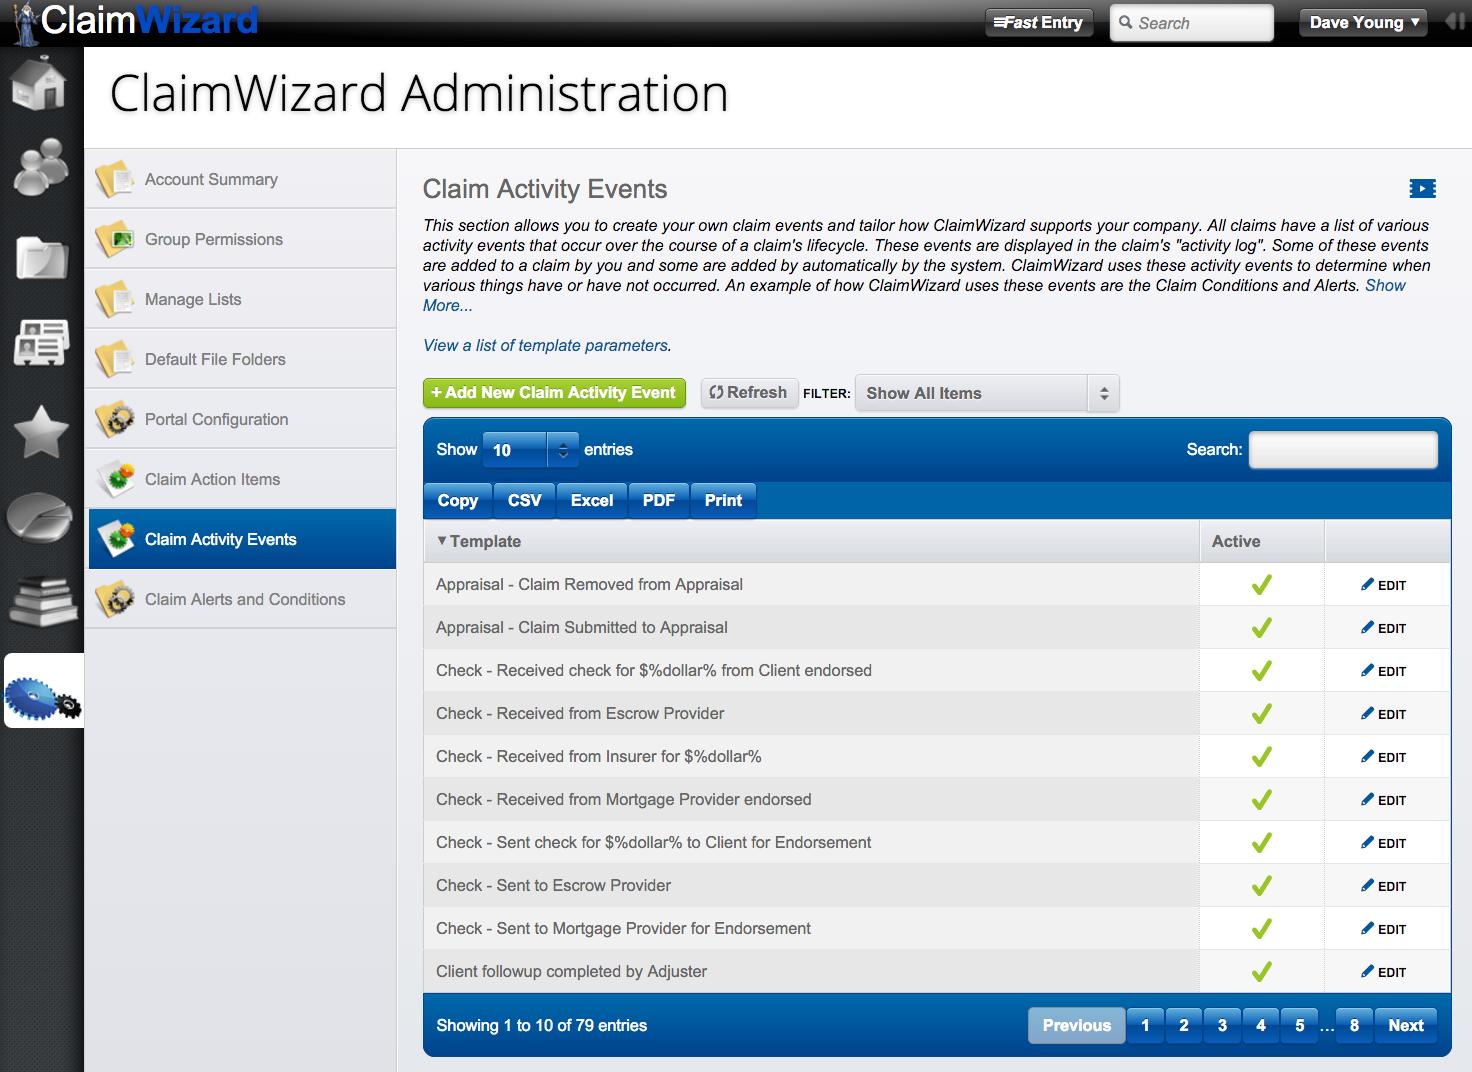 ClaimWizard - Admin Tab - Claim Activity Events